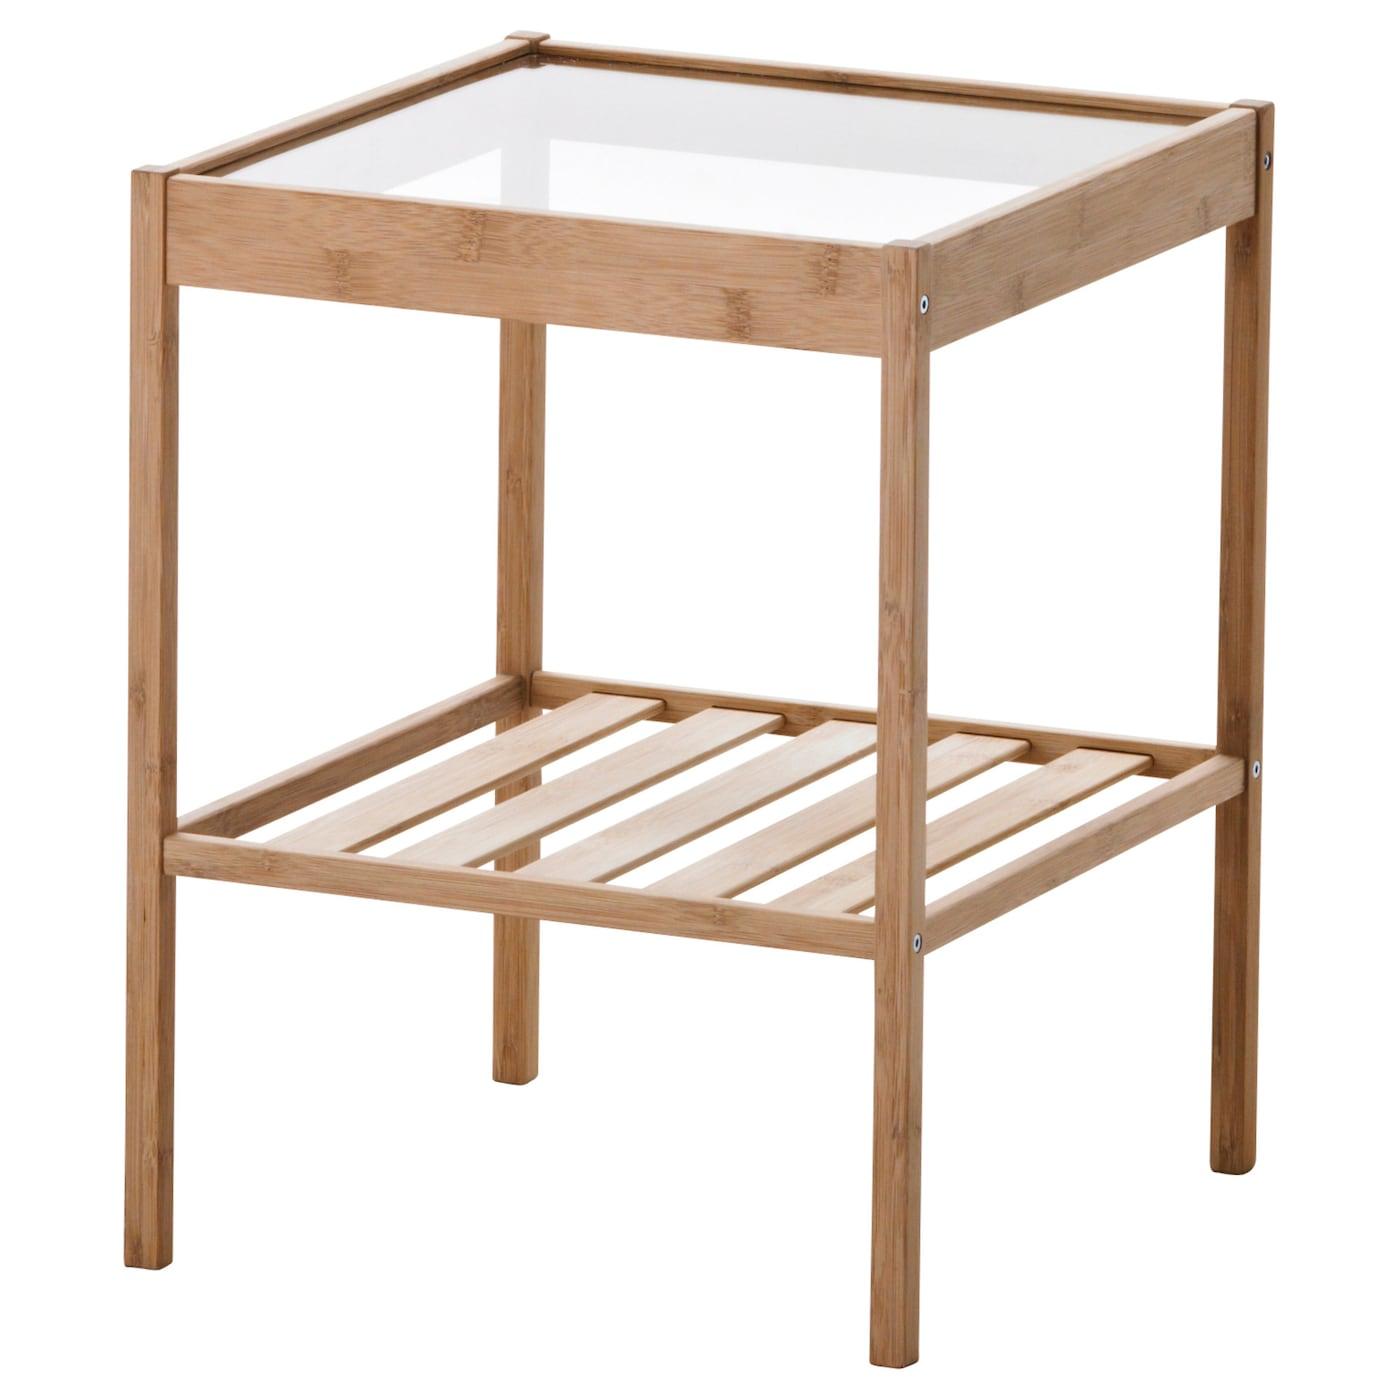 NESNA Bedside table 10x10 cm